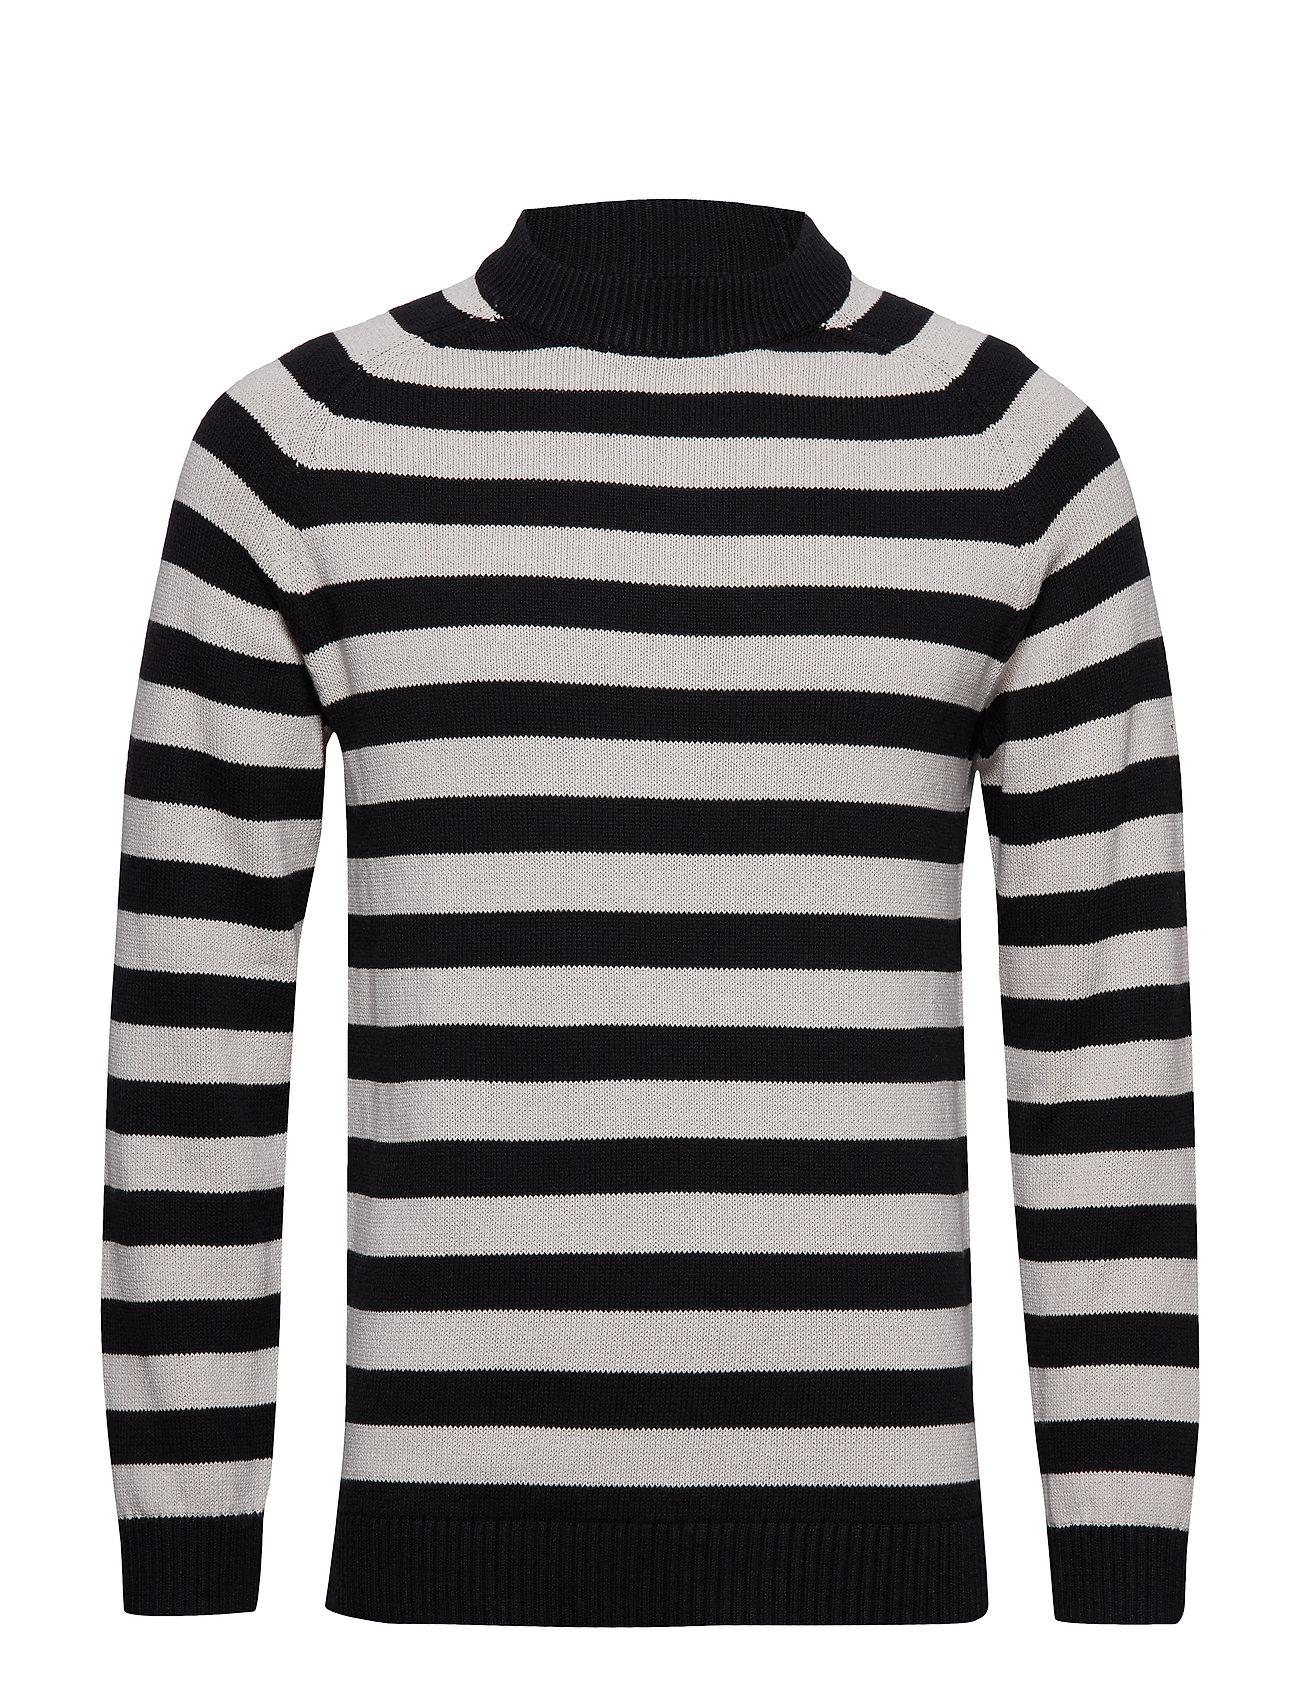 Lexington Clothing Gerald Striped Sweater